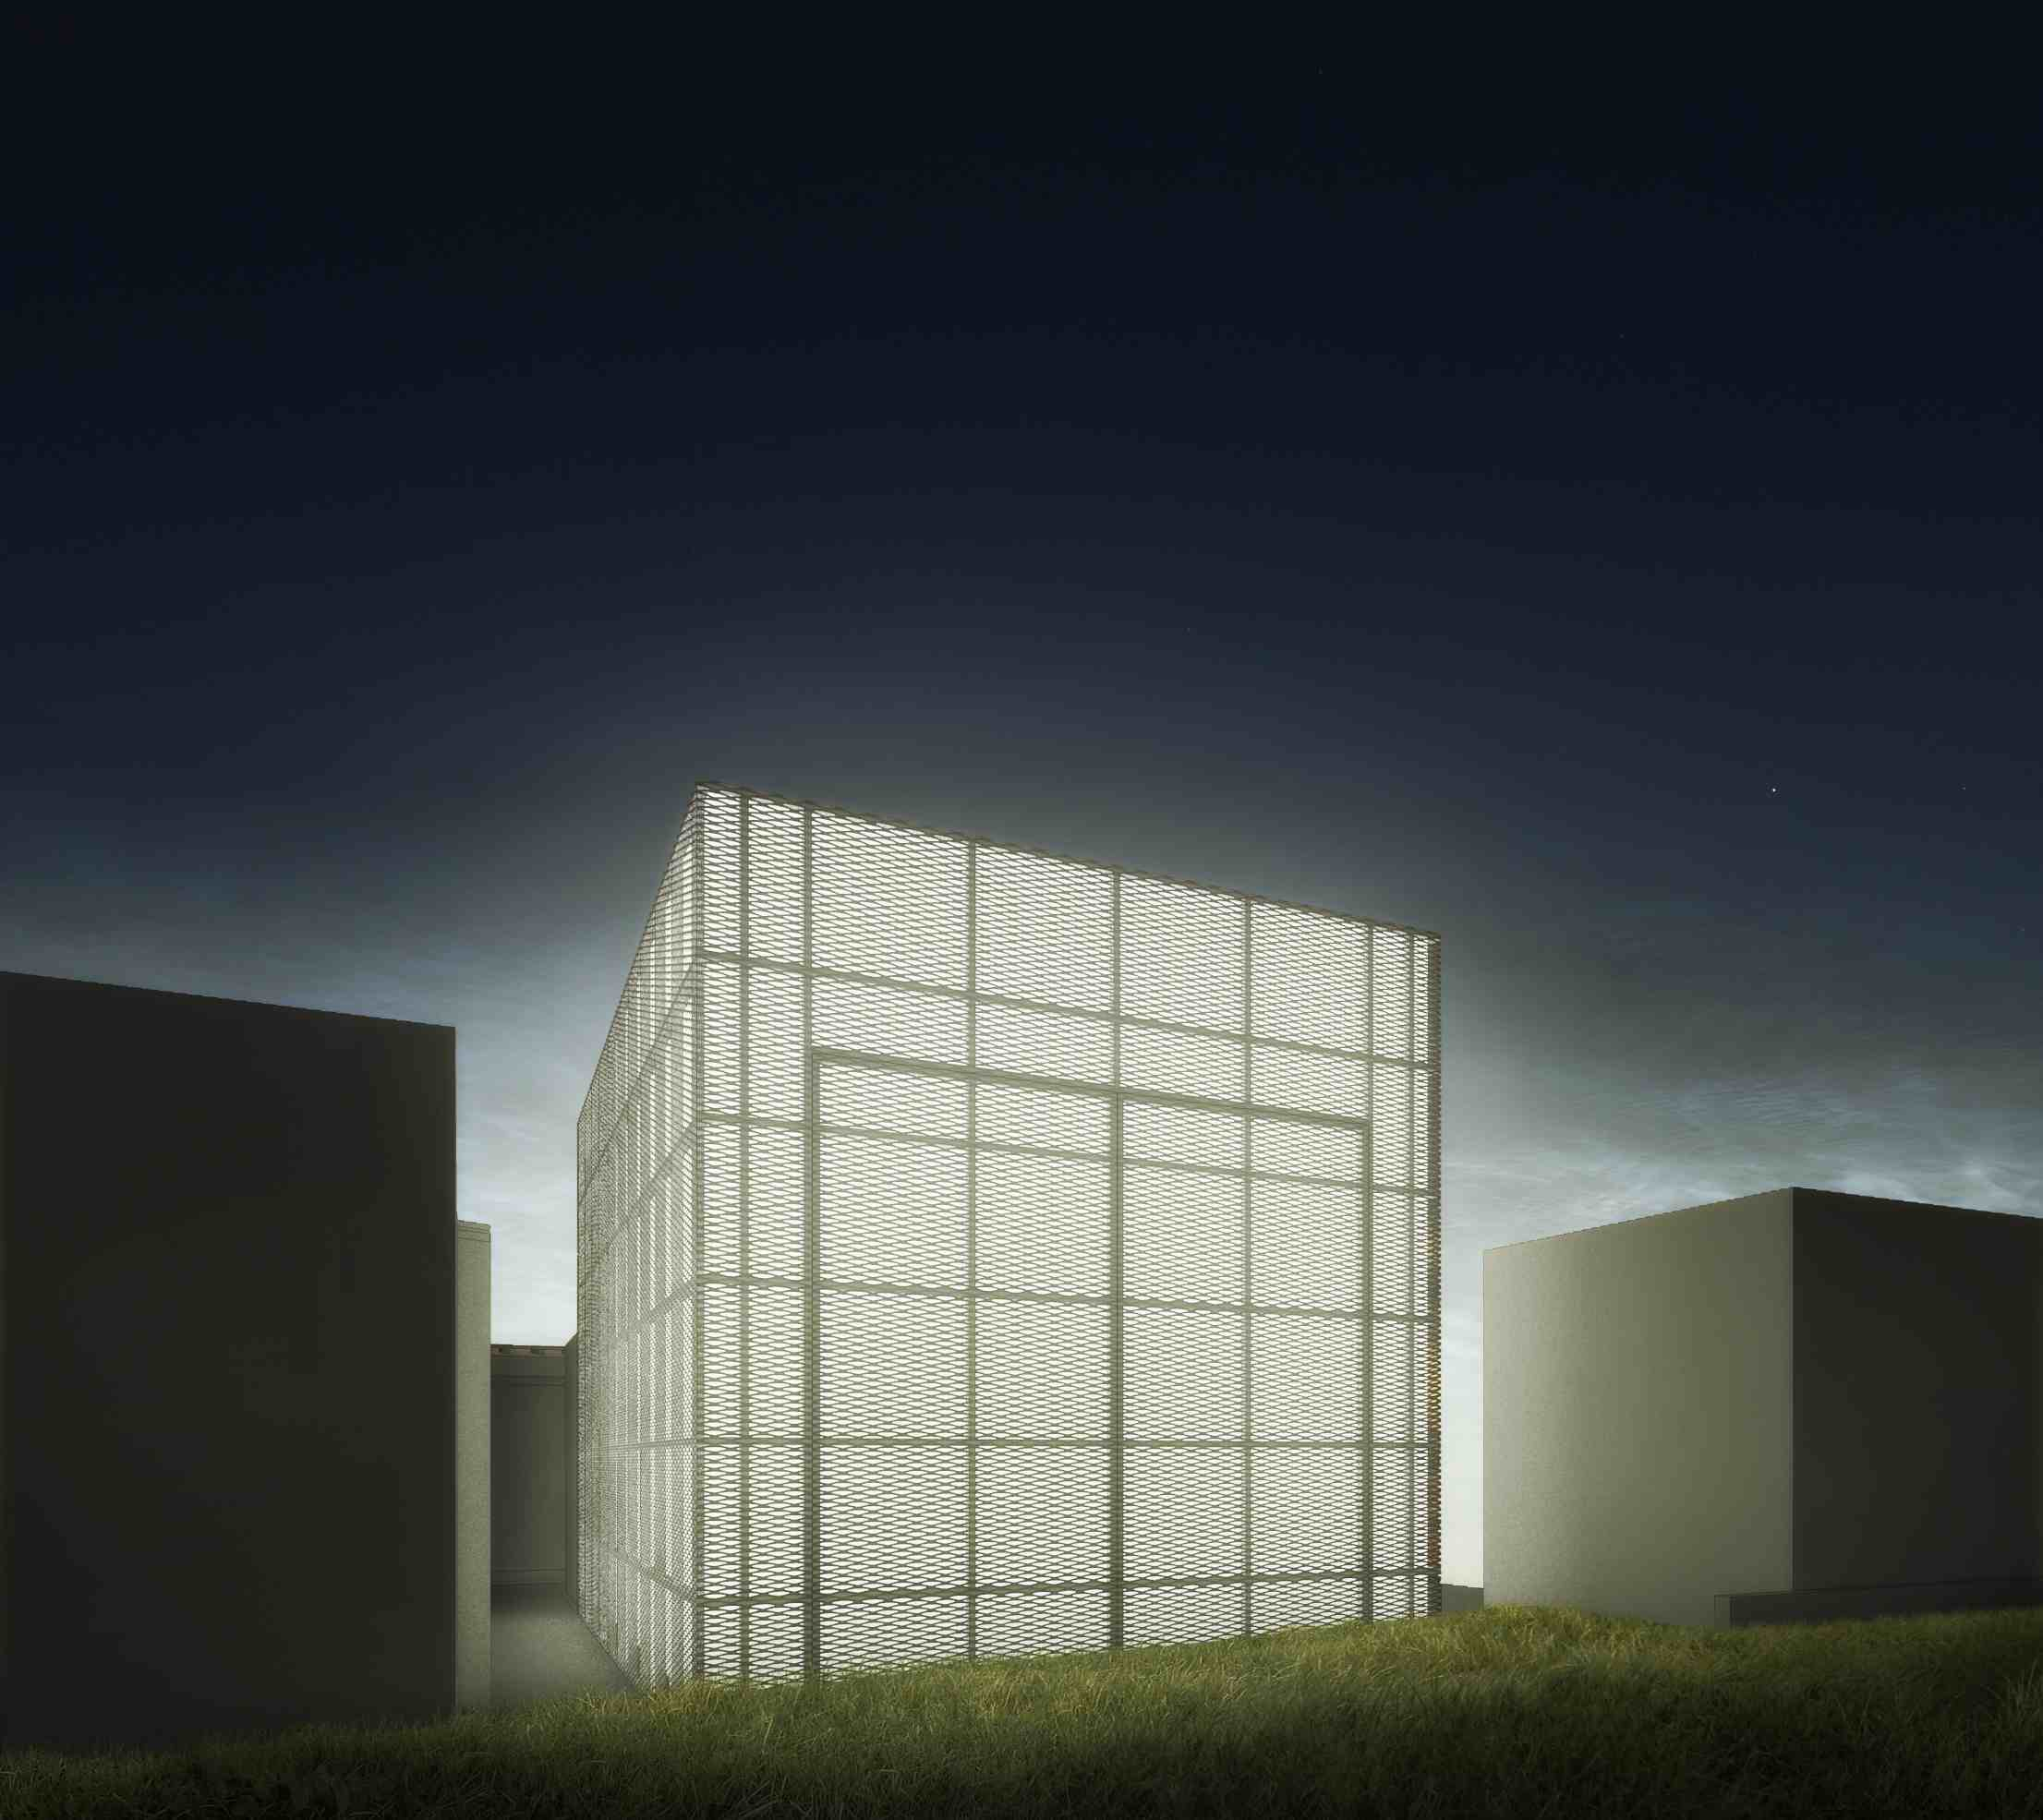 Teatro Multiuso - perspectiva externa - Crédito Haiko Cirne Sinnema